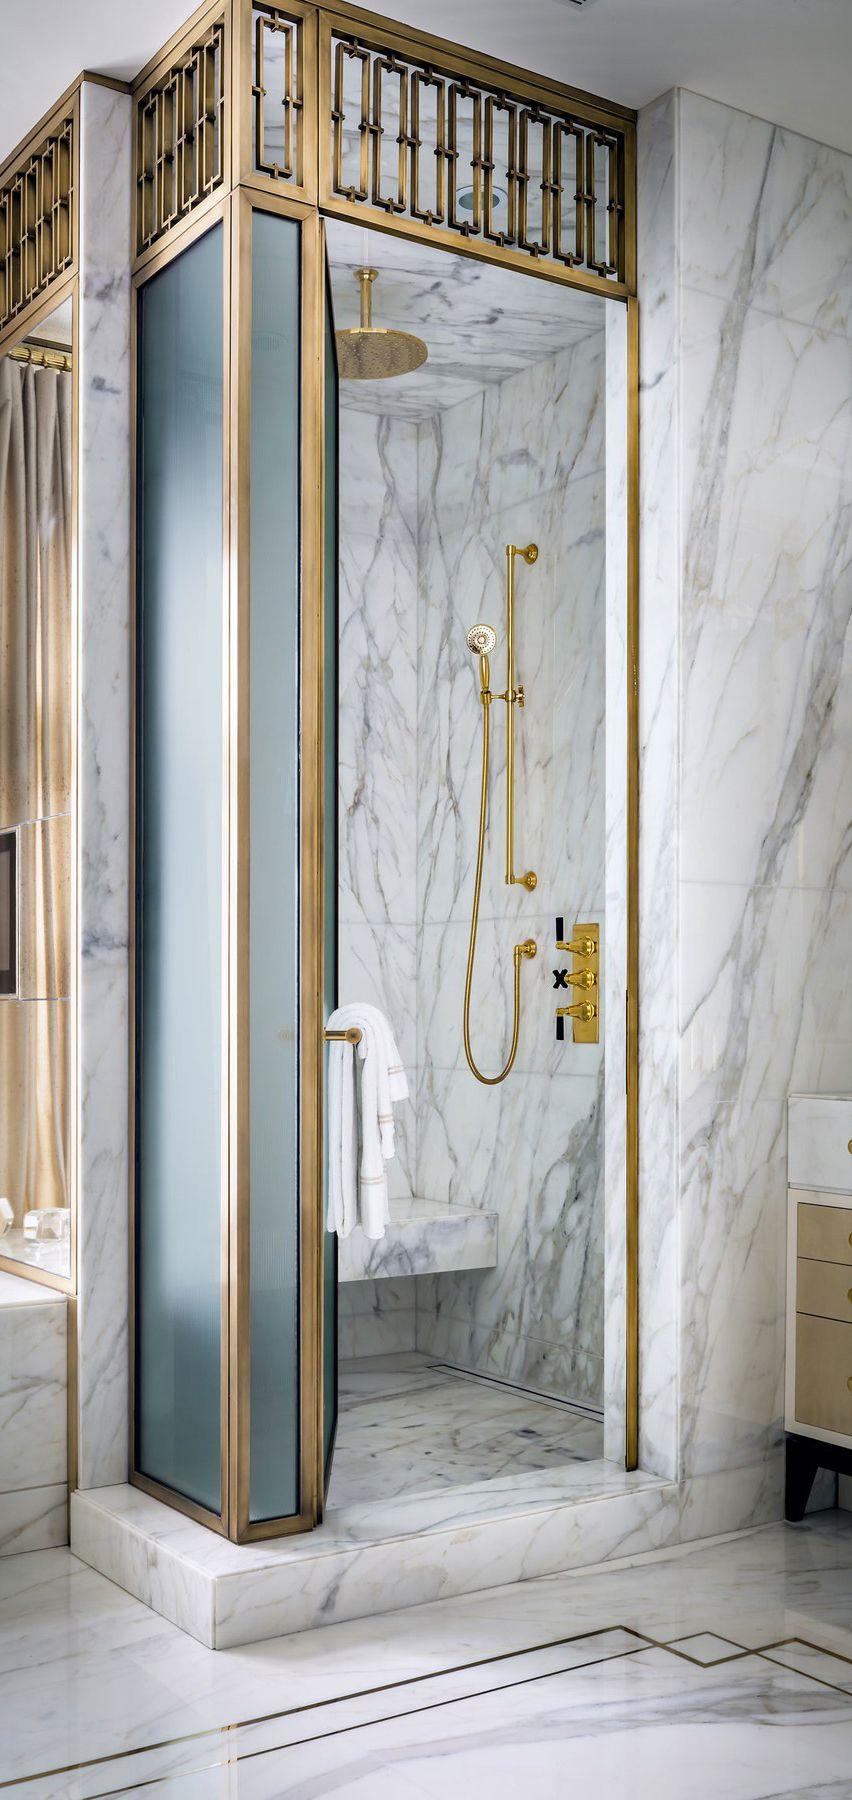 Bathroom Ideas | Beautiful Baths | Pinterest | Glamorous bathroom ...